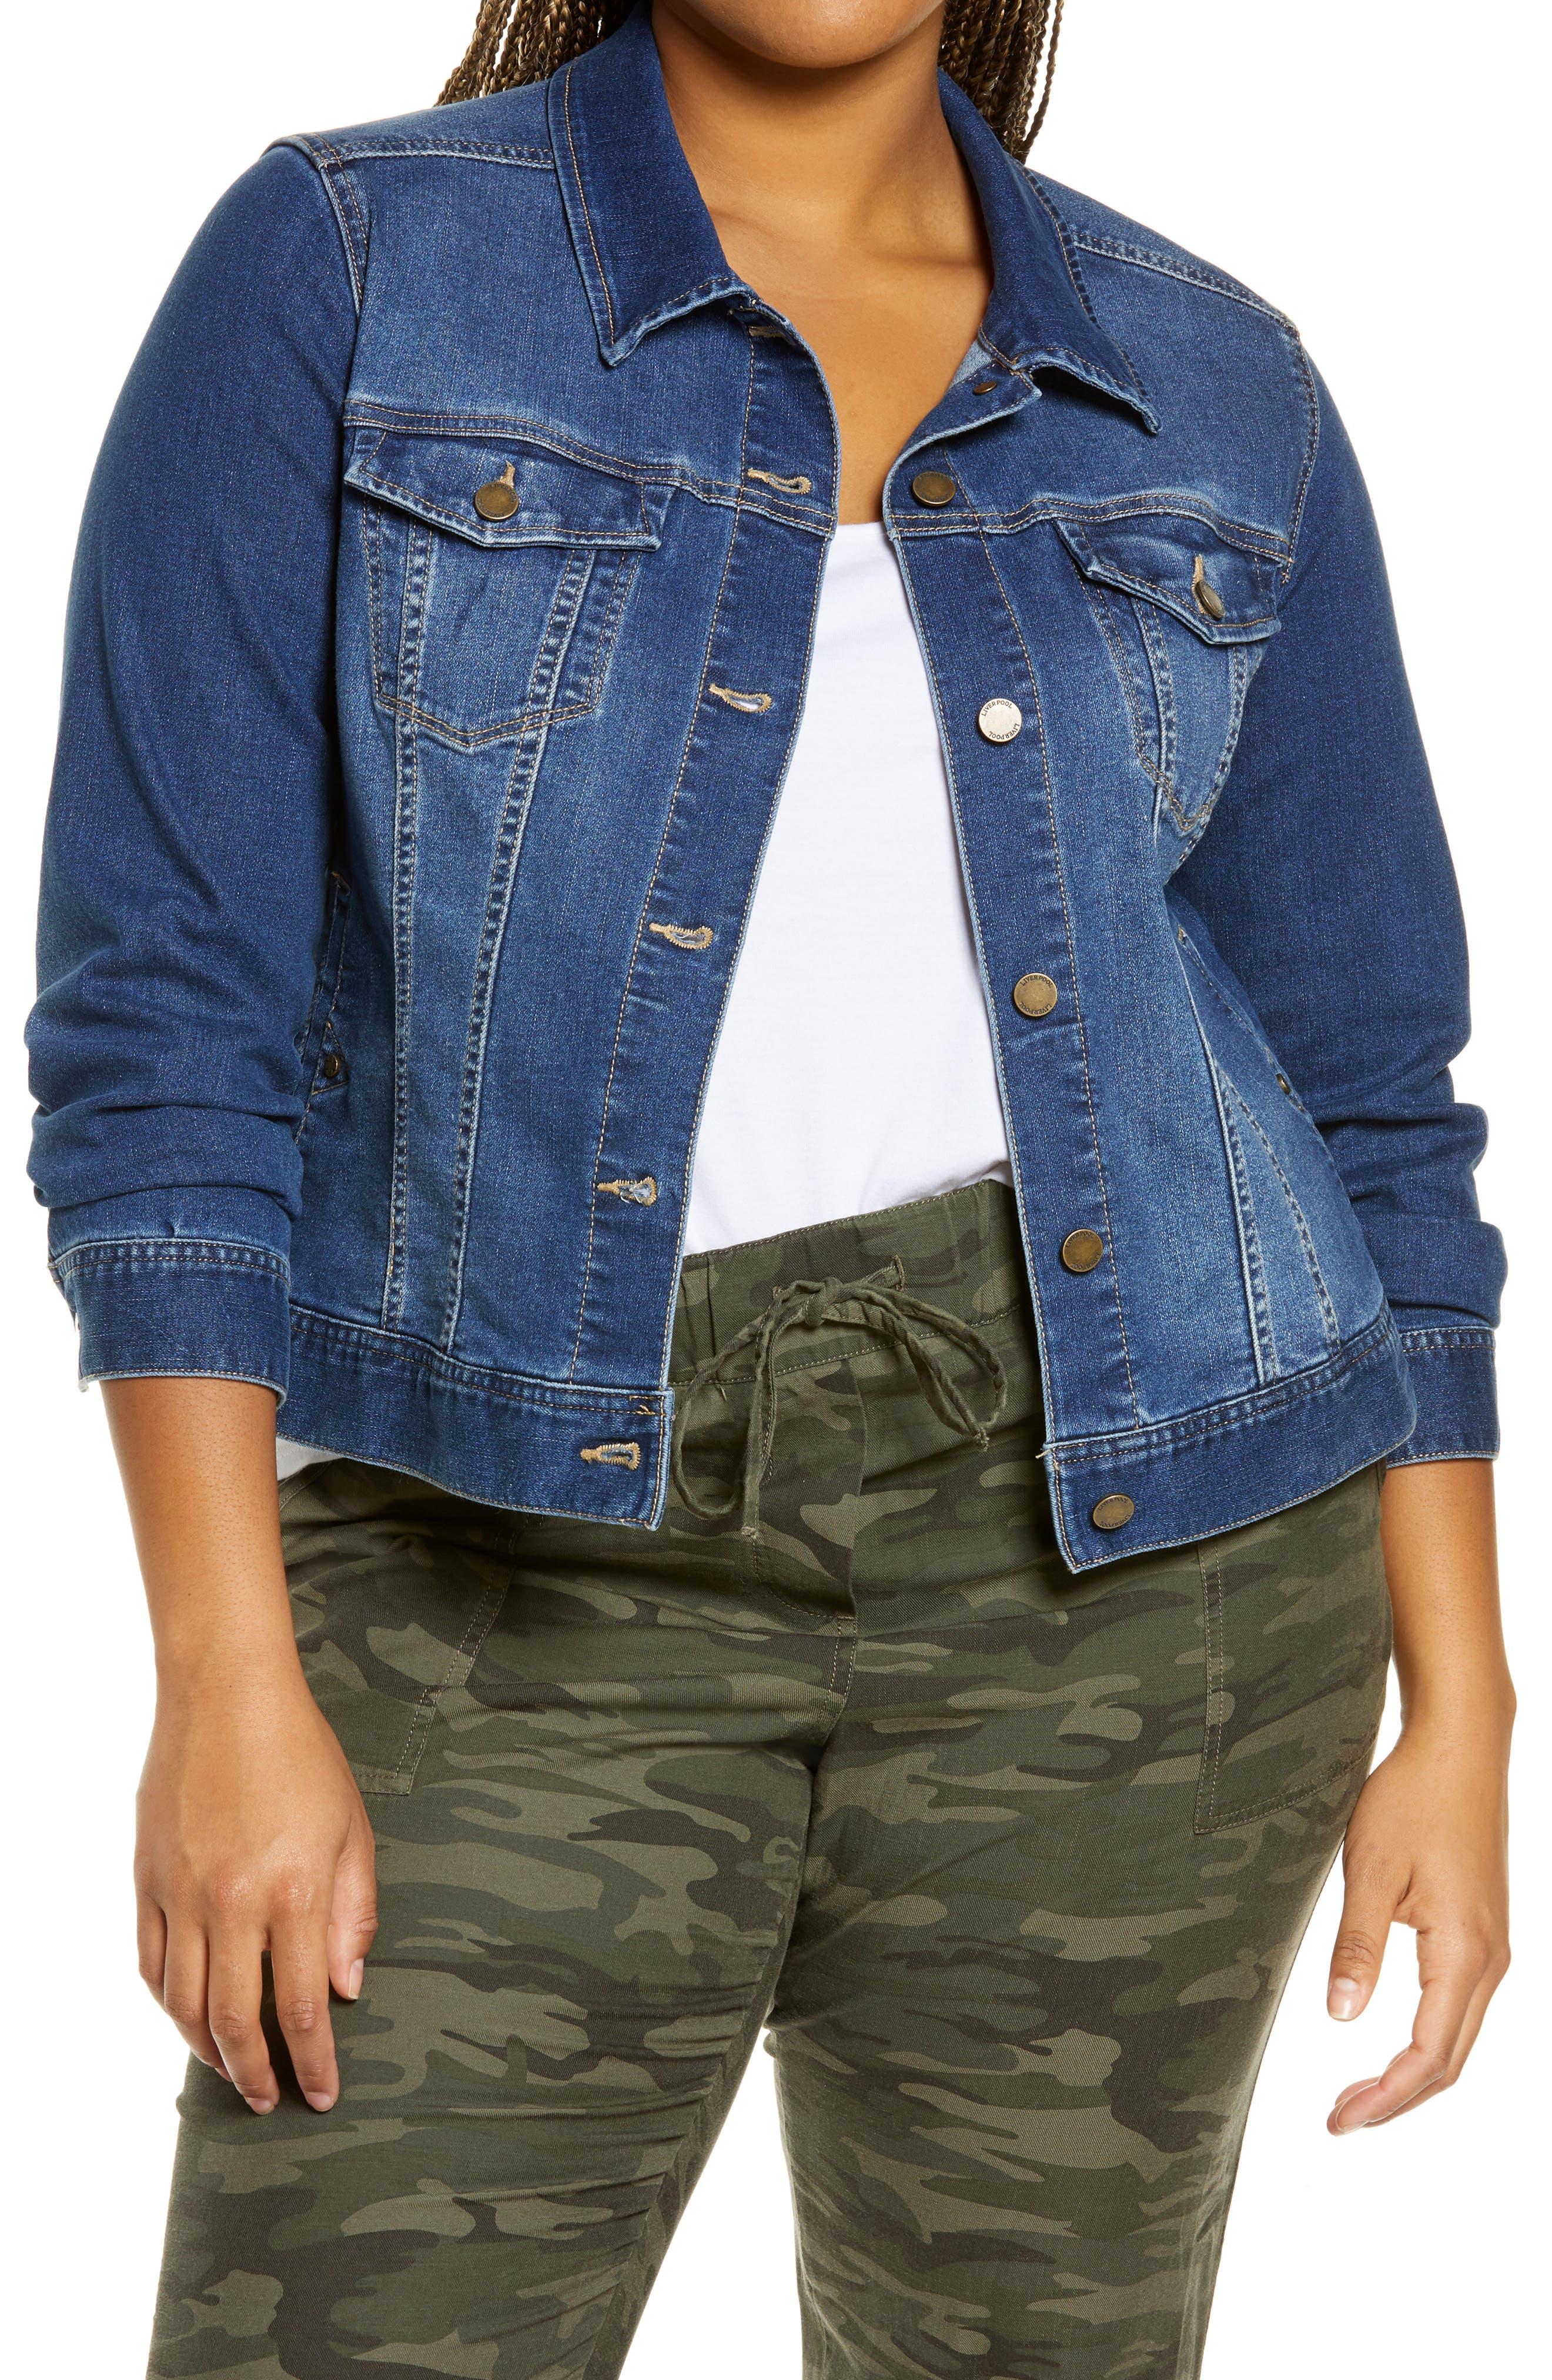 Men/'s Long Sleeve Denim Shirt Camo Patchwork Blouse Frayed Jeans Coats Casual US